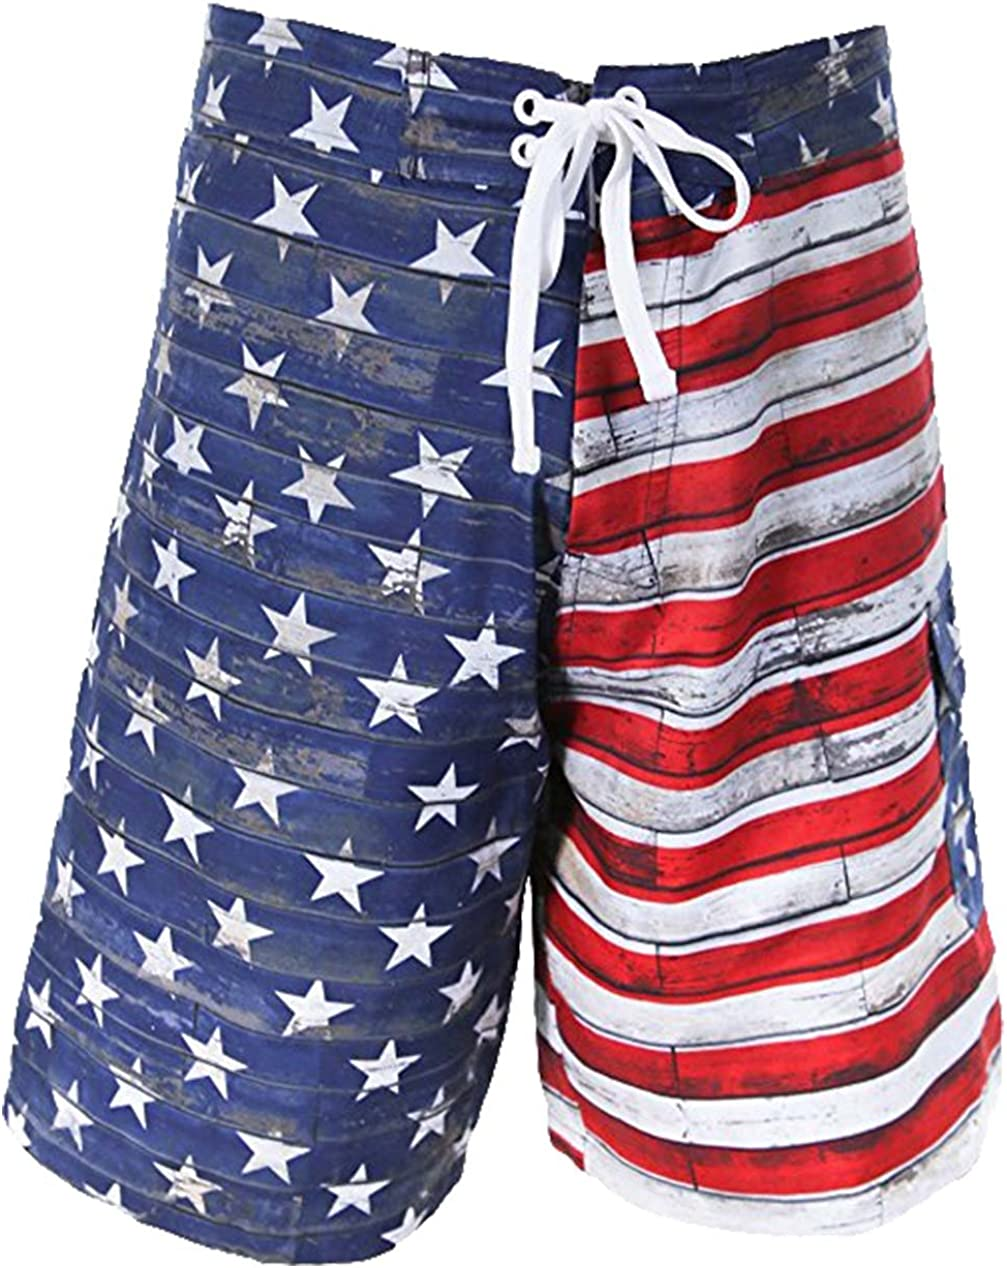 Calhoun Sportswear Mens Distressed USA Flag Swim Board Shorts - S